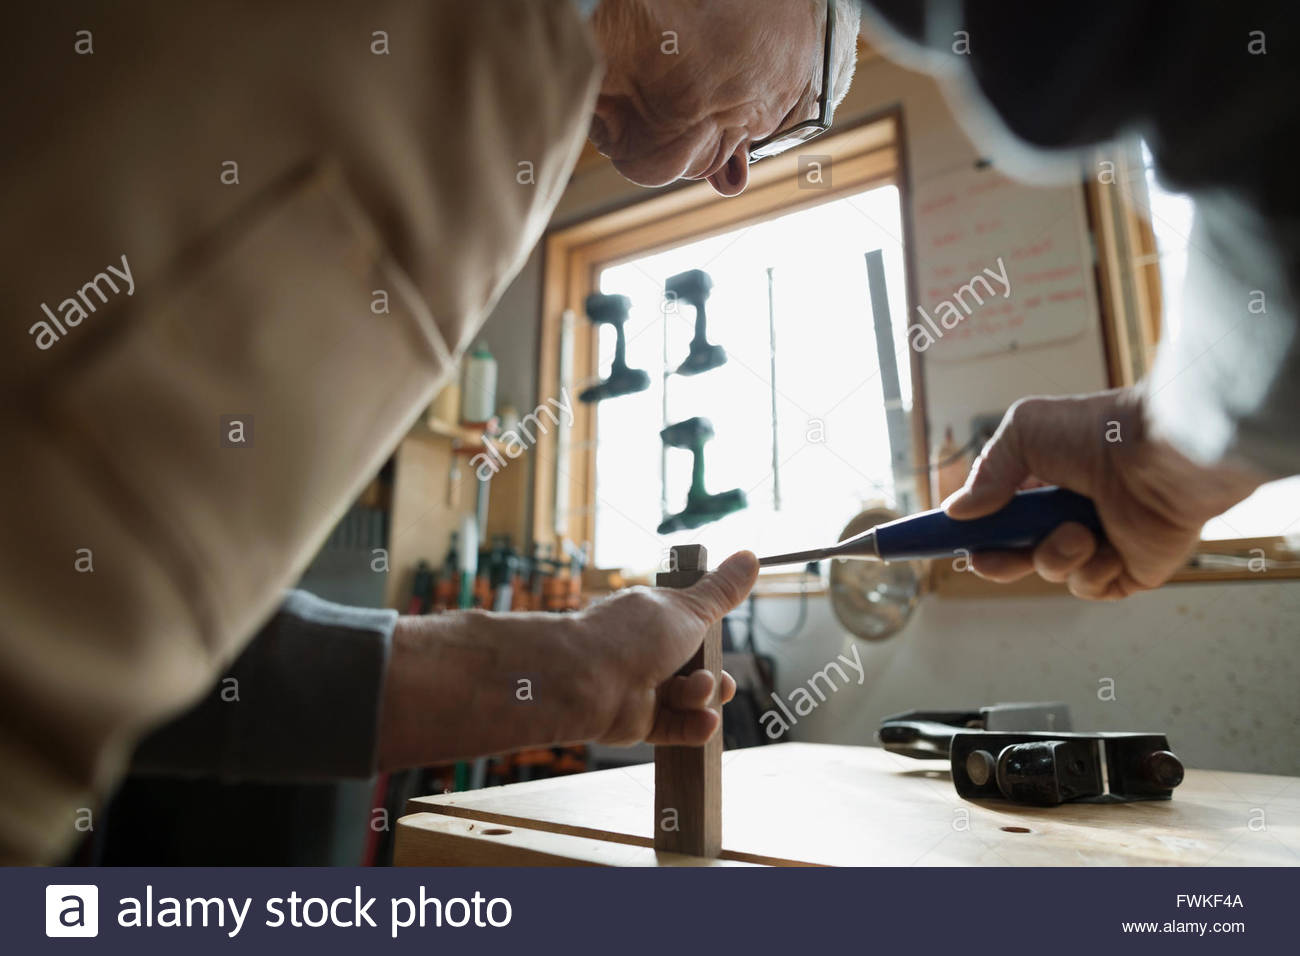 Carpenter using chisel on wood block in workshop - Stock Image